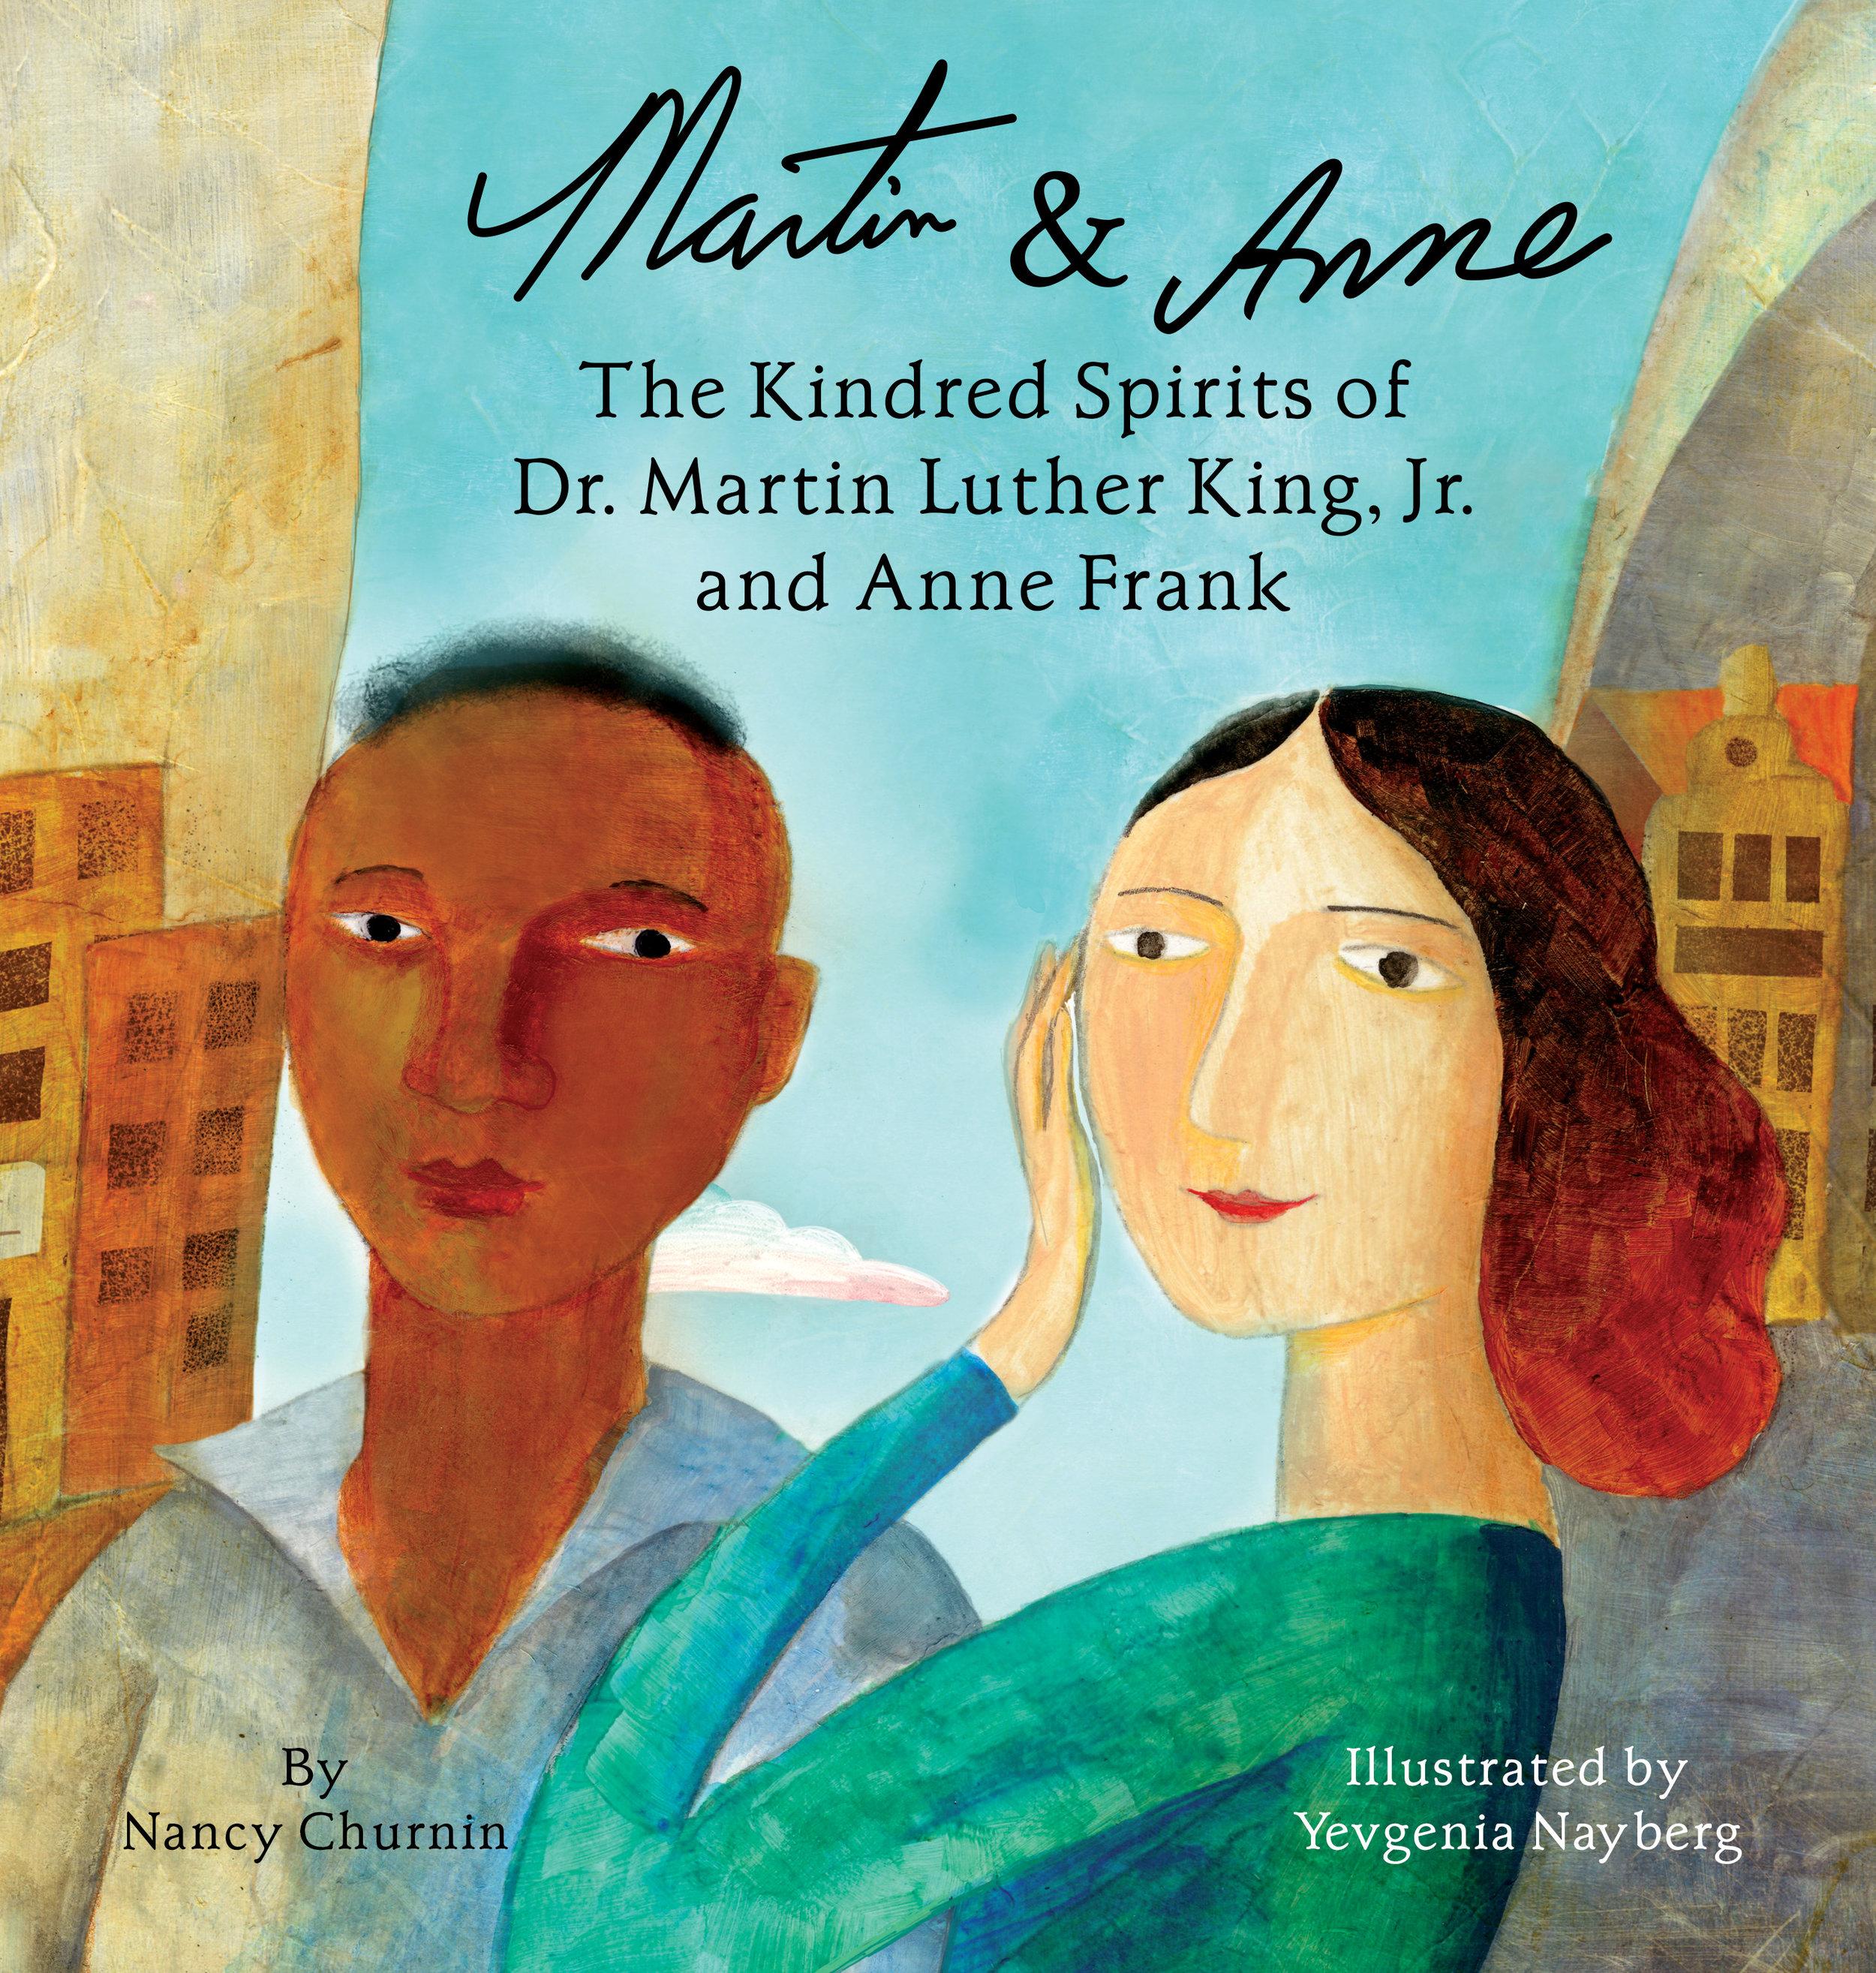 'Martin & Anne' by Nancy Churnin, illustrated by Yevgenia Nayberg